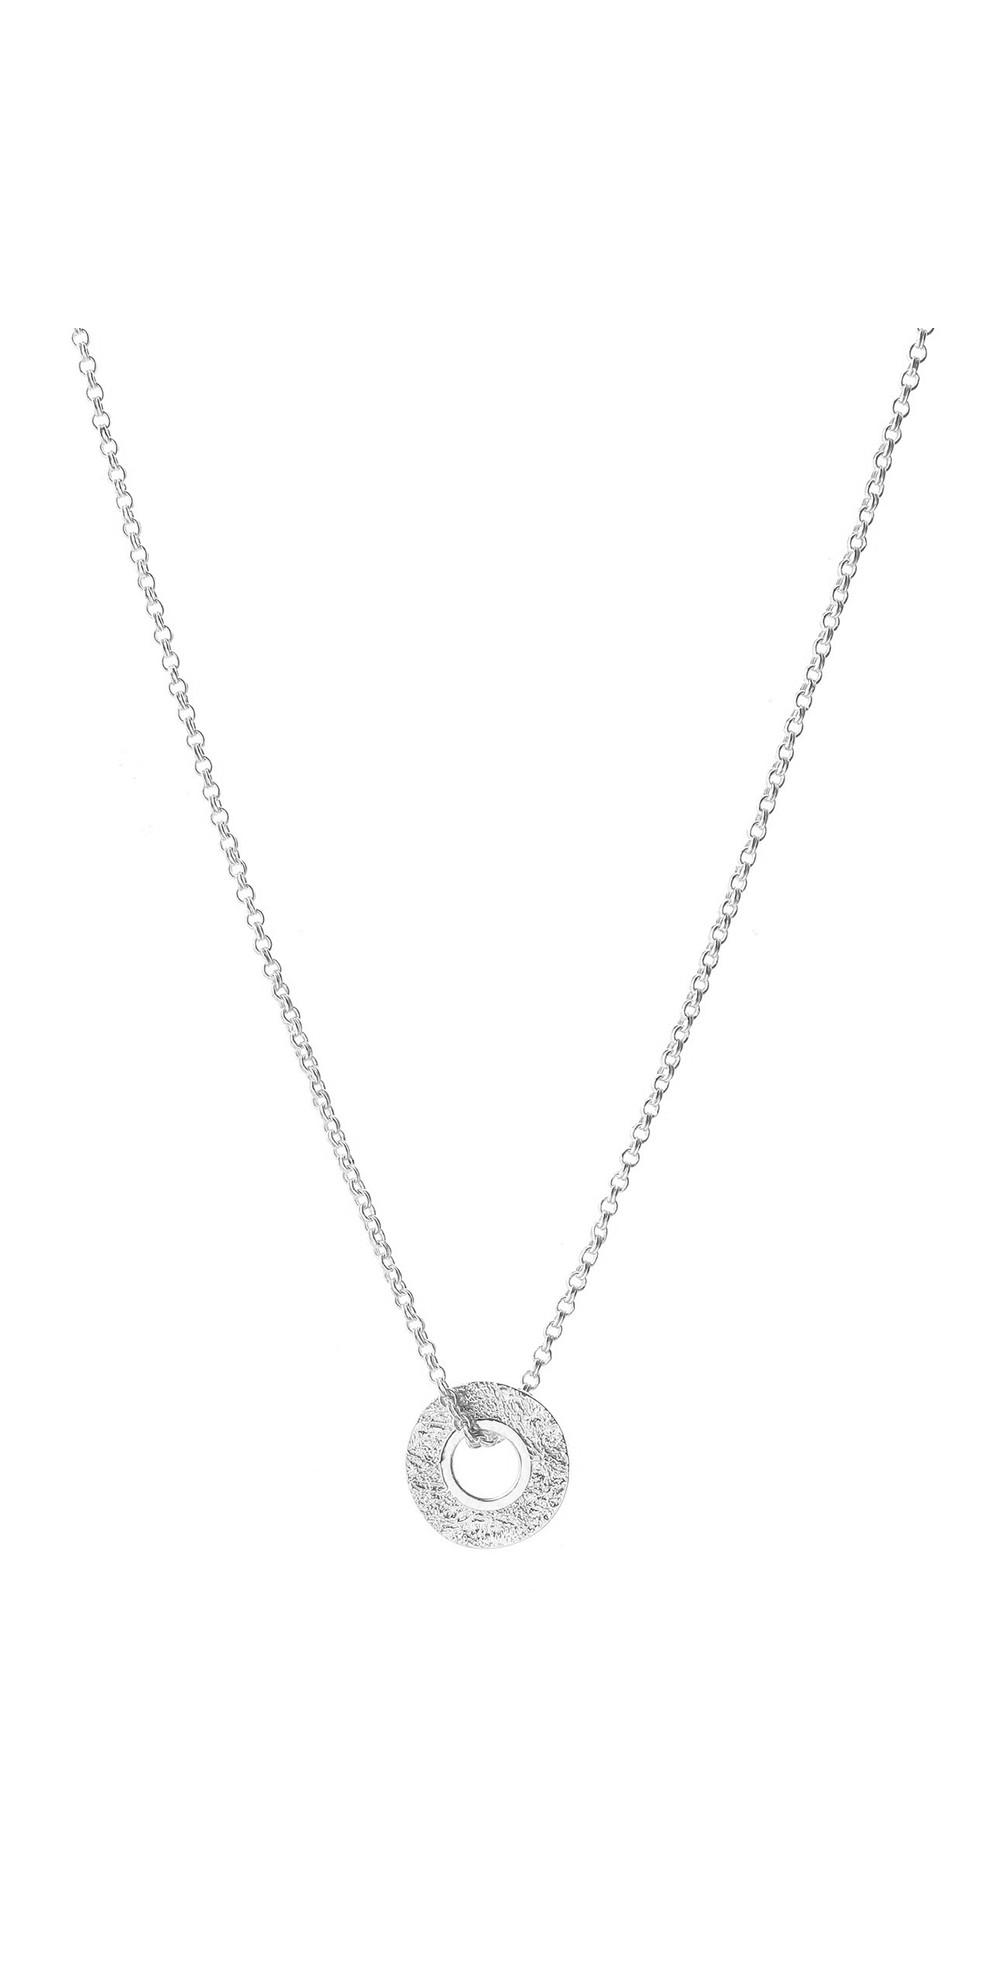 Mineral Coastal Necklace main image